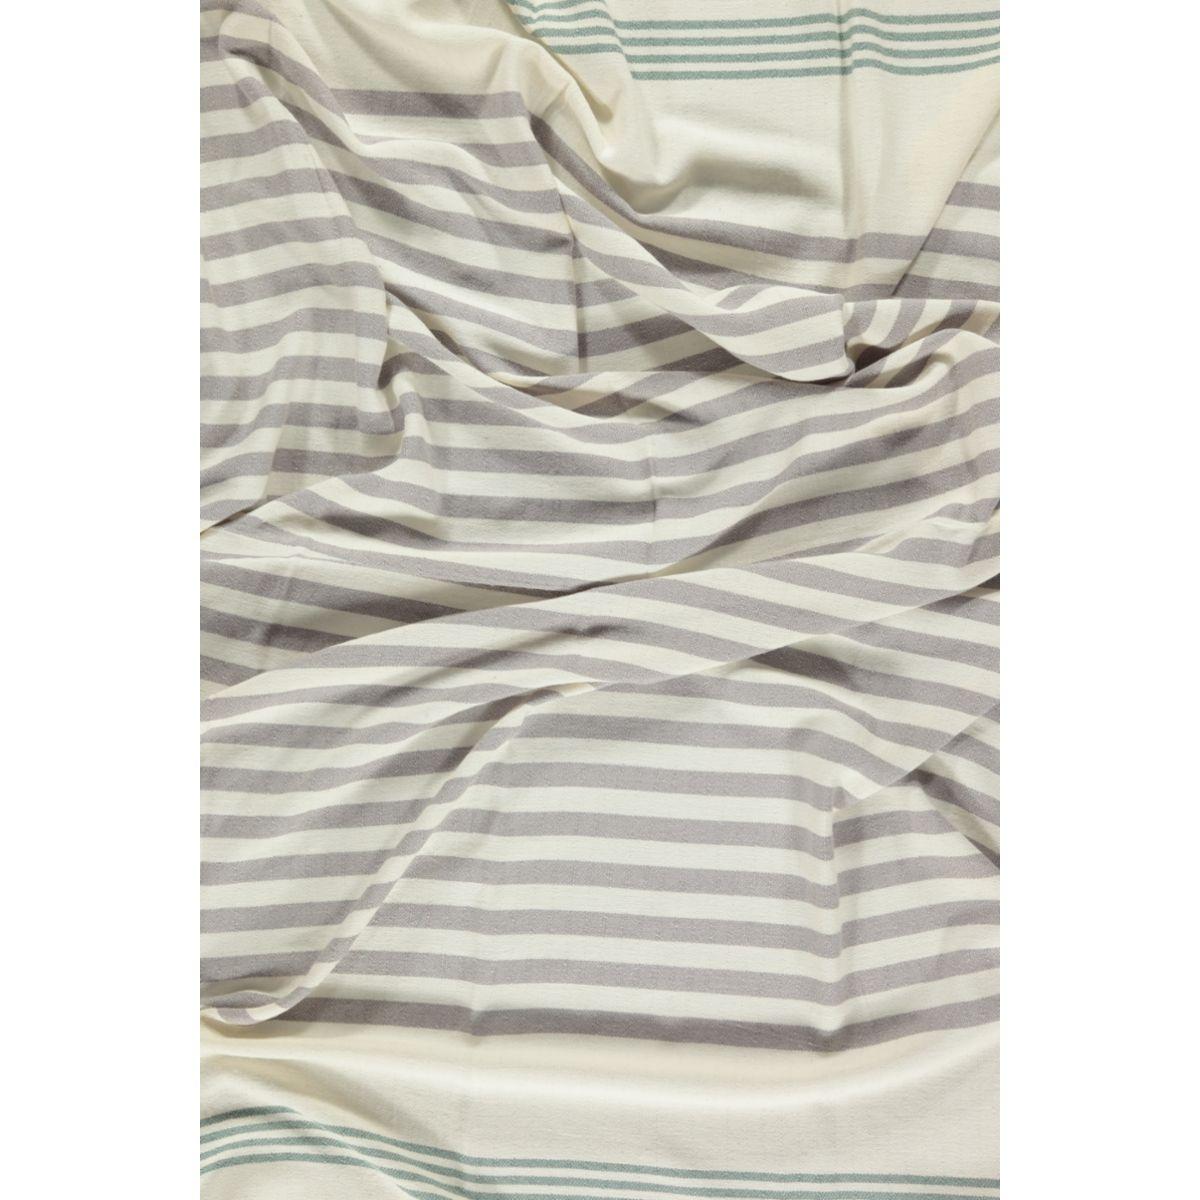 Peshtemal / Towel - Sultan FUN - Almond Green / Light Grey